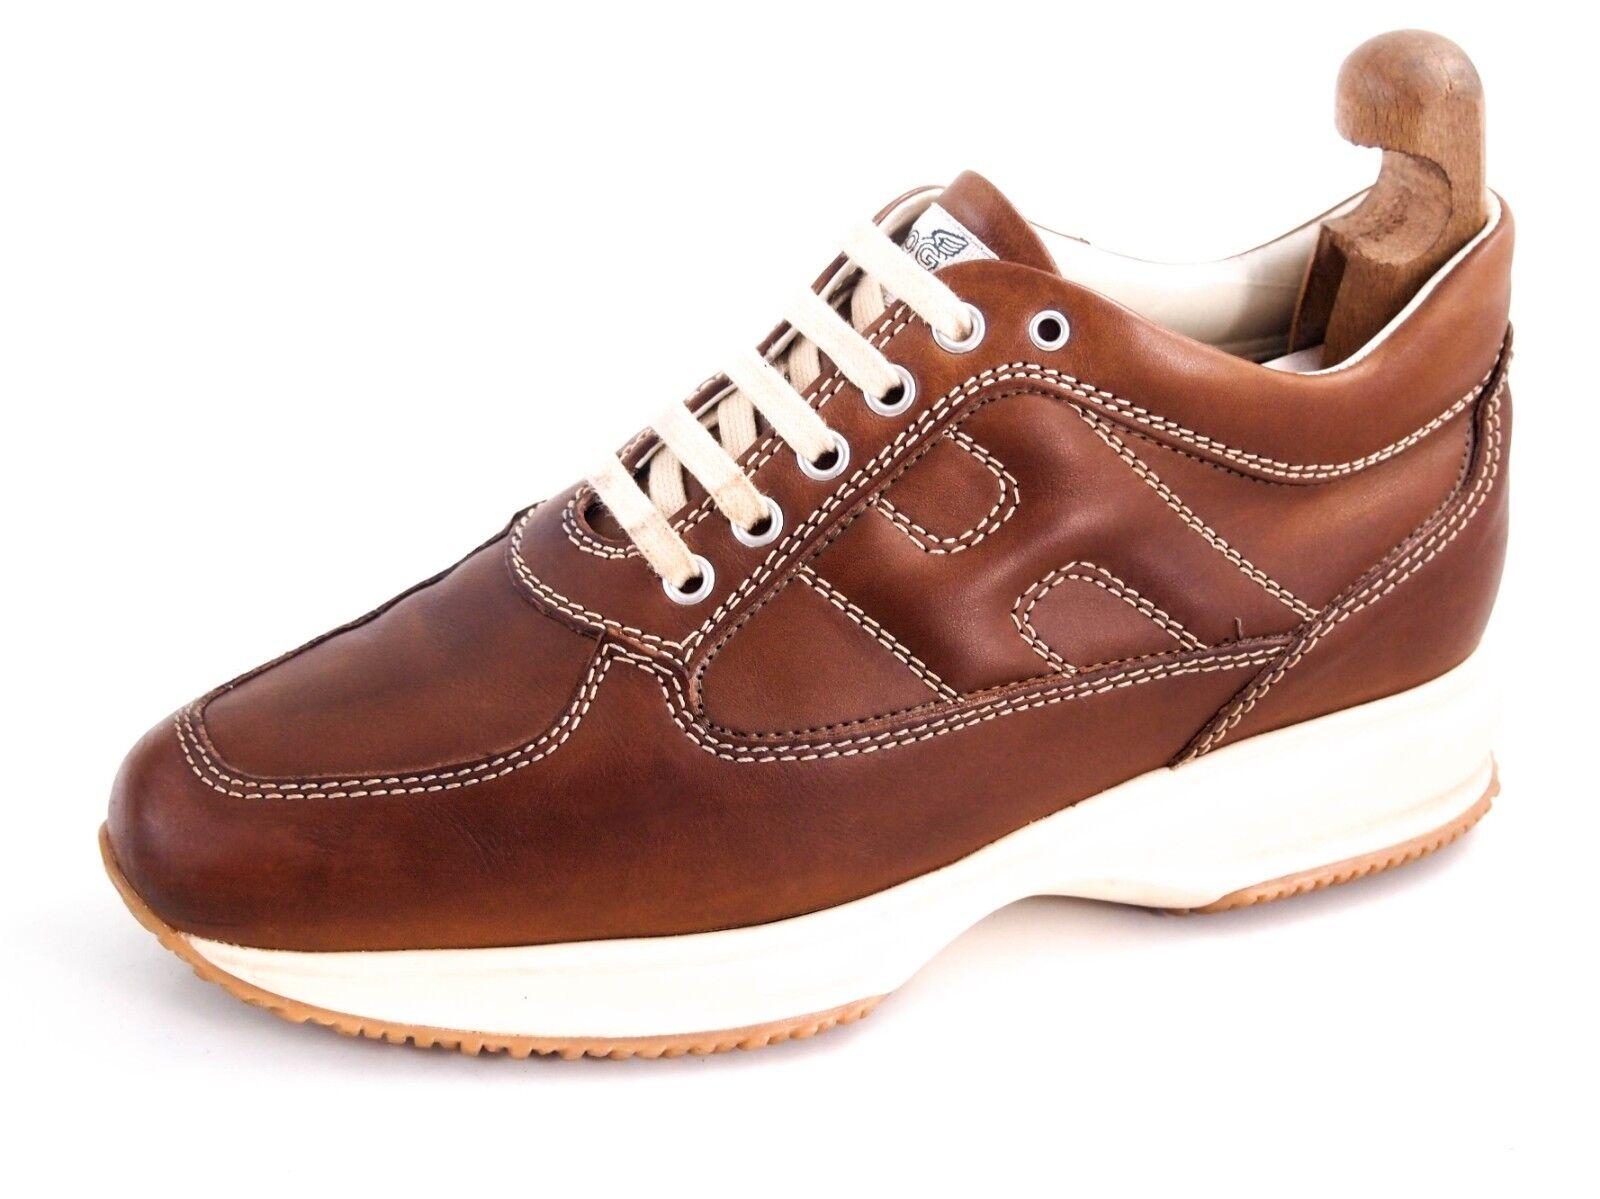 Hogan sneakers, brown leather, men's shoe size US 8 EU 41  480